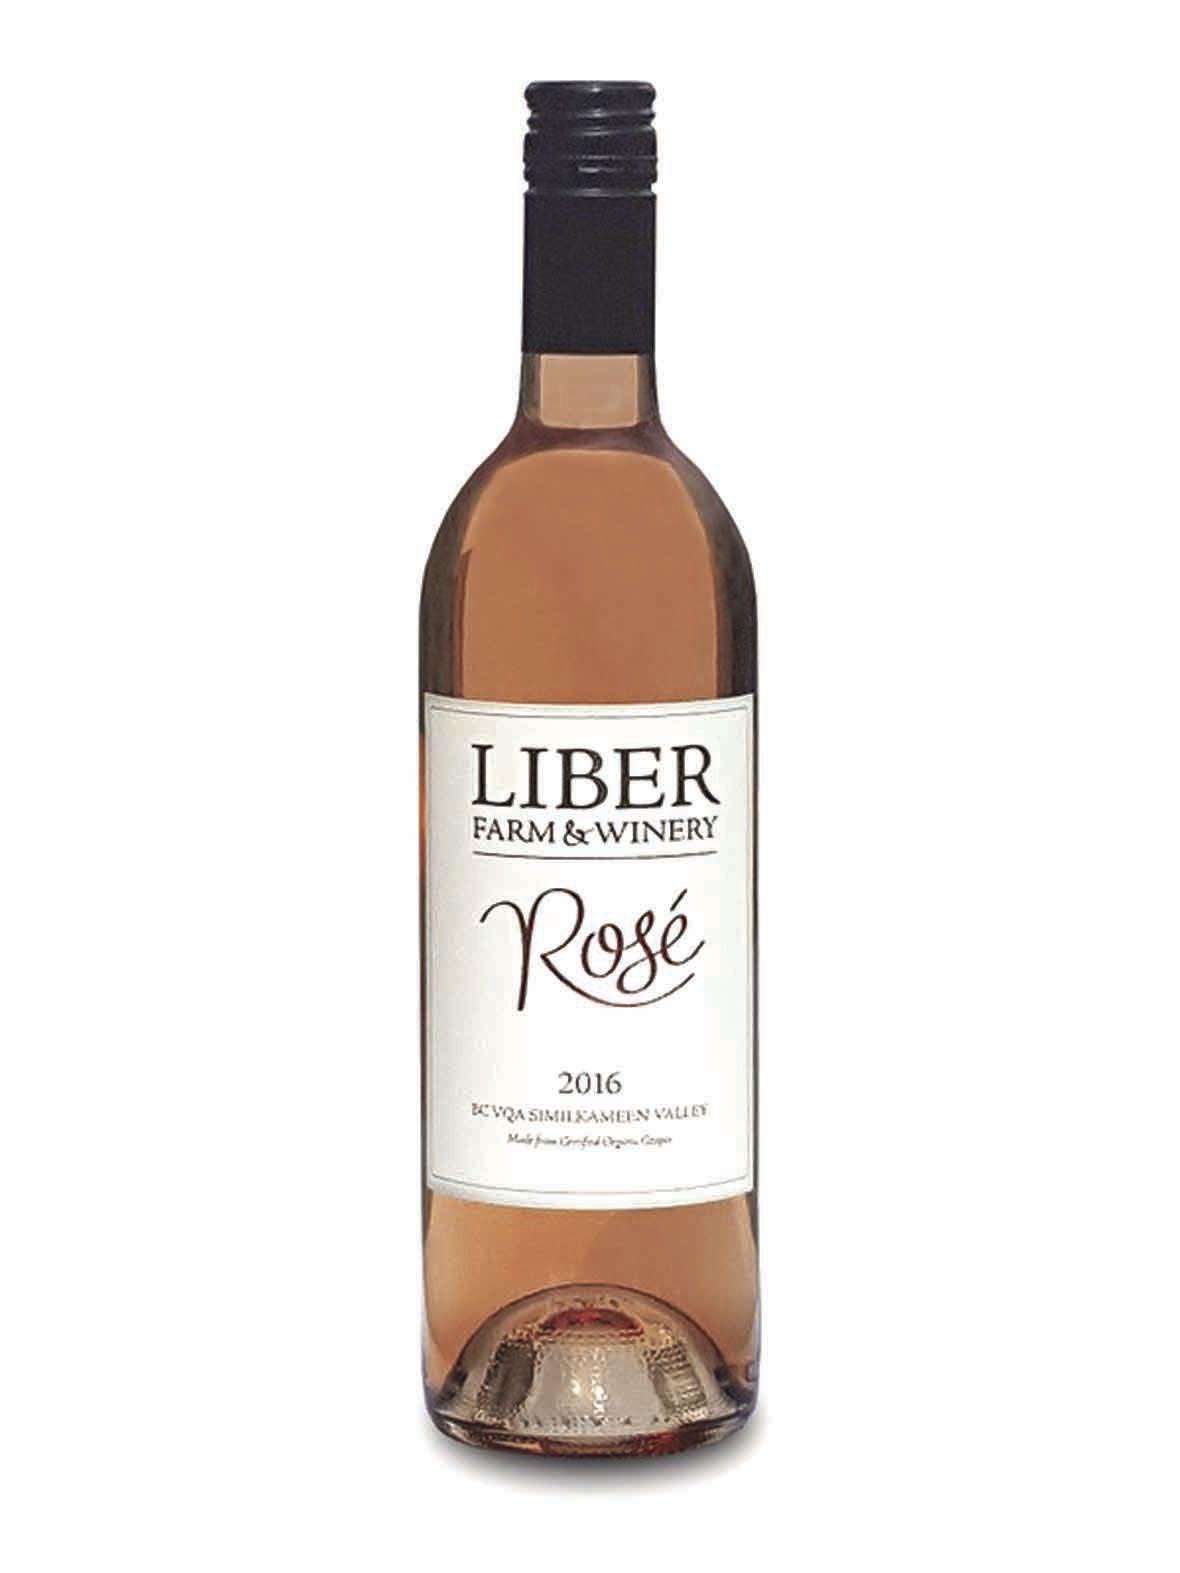 Liber rose ($22)